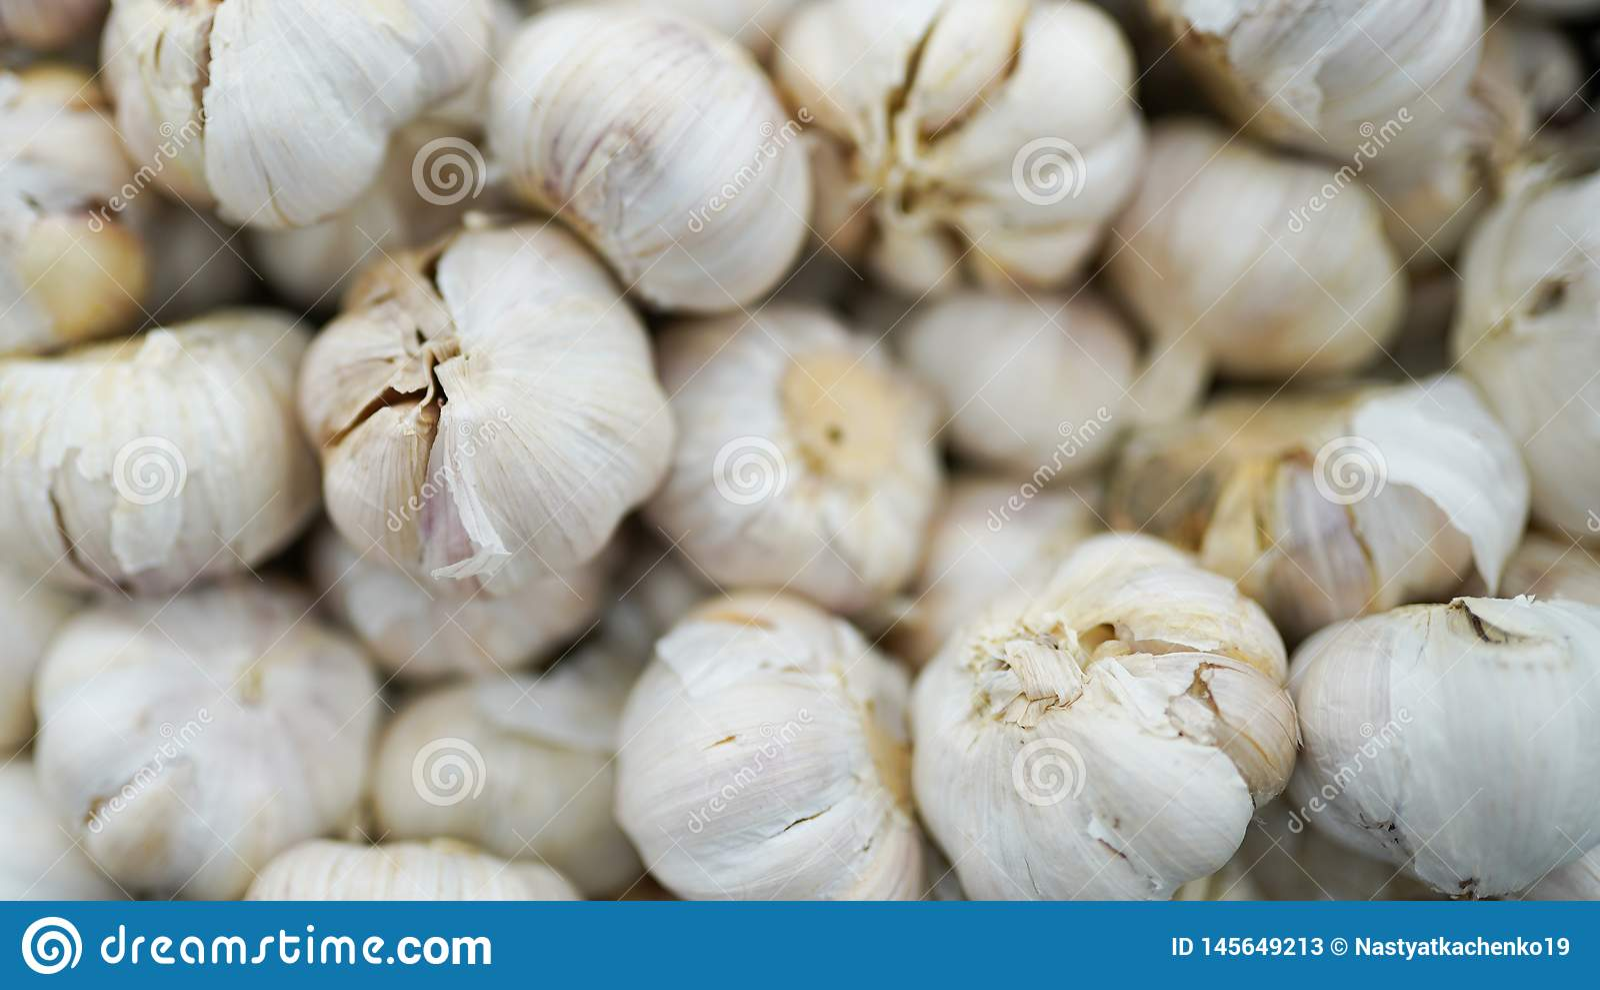 Garlic pile texture. Fresh garlic on market table close-up photo. Vitamin healthy food spice image